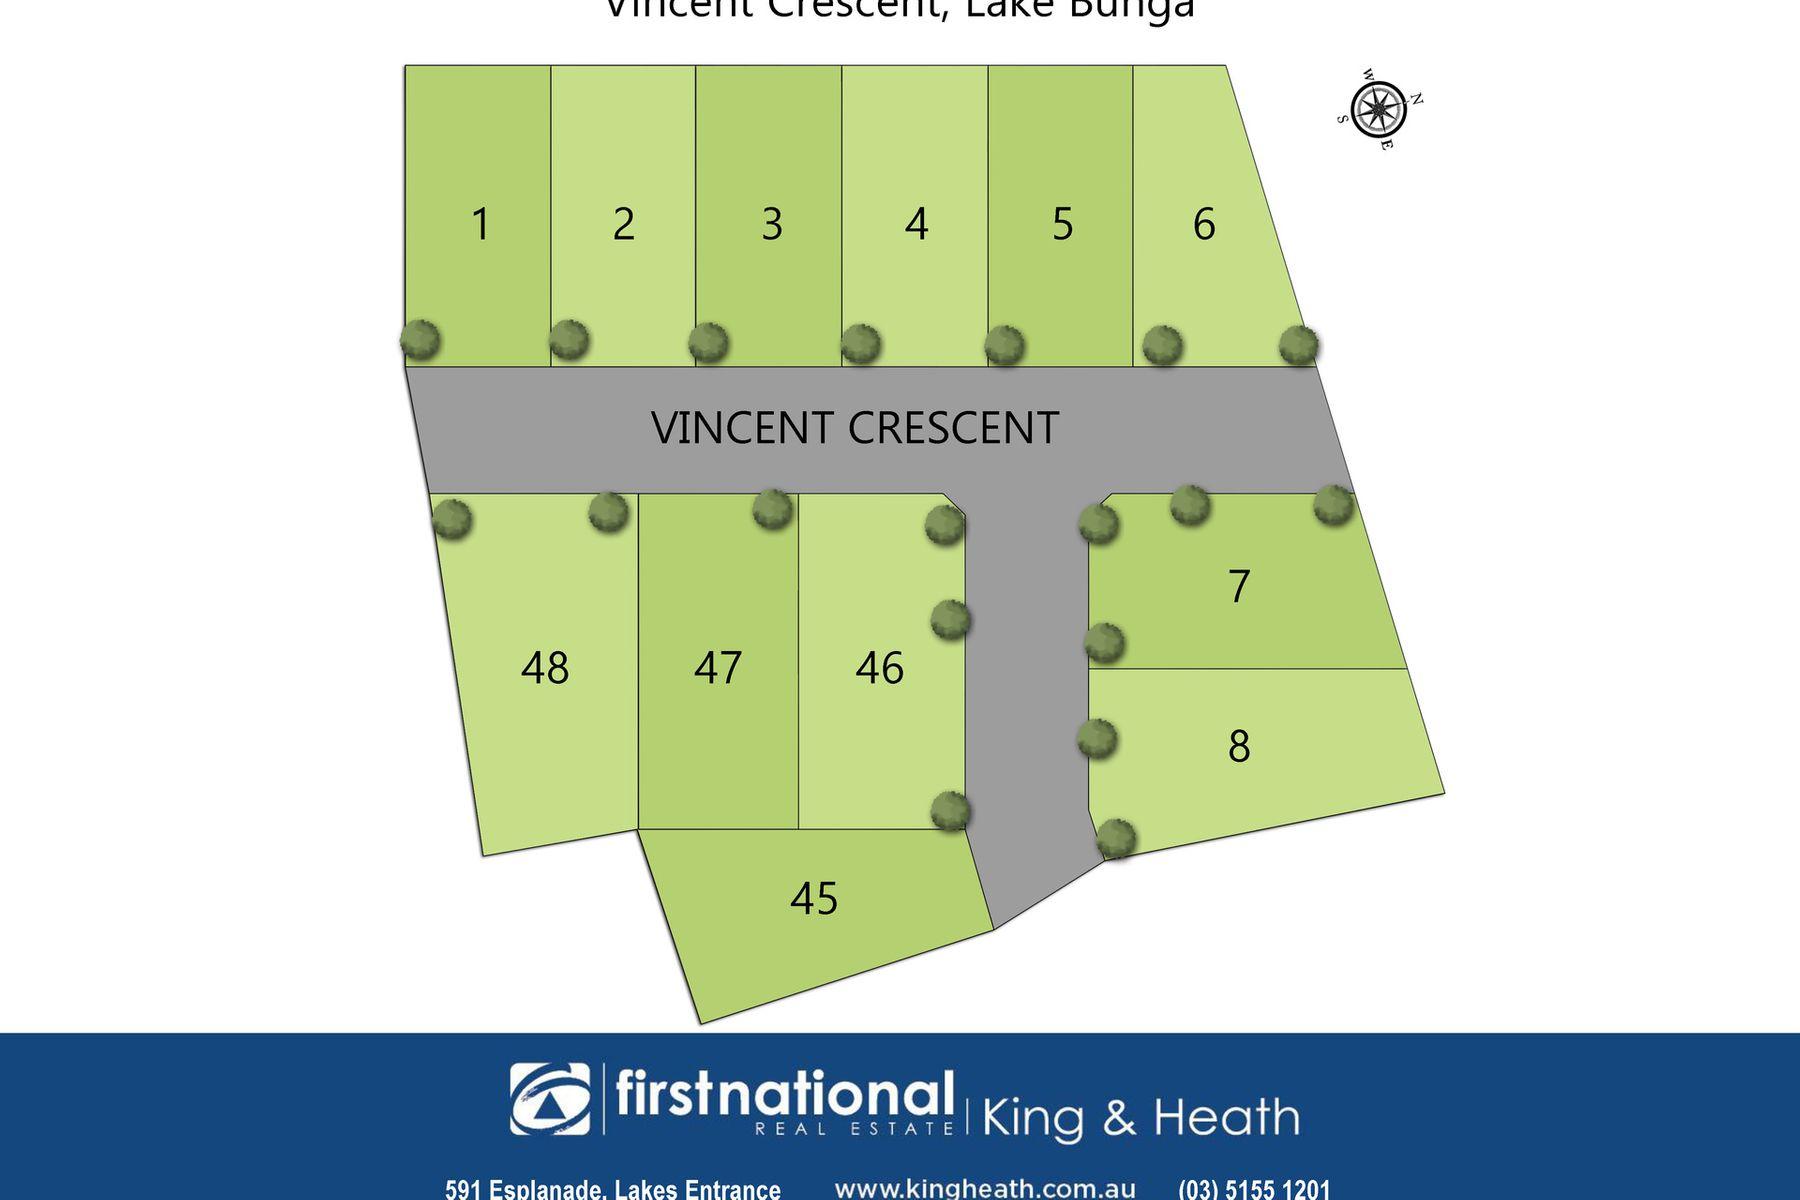 Lot 47, 8 Vincent Crescent, Lake Bunga, VIC 3909